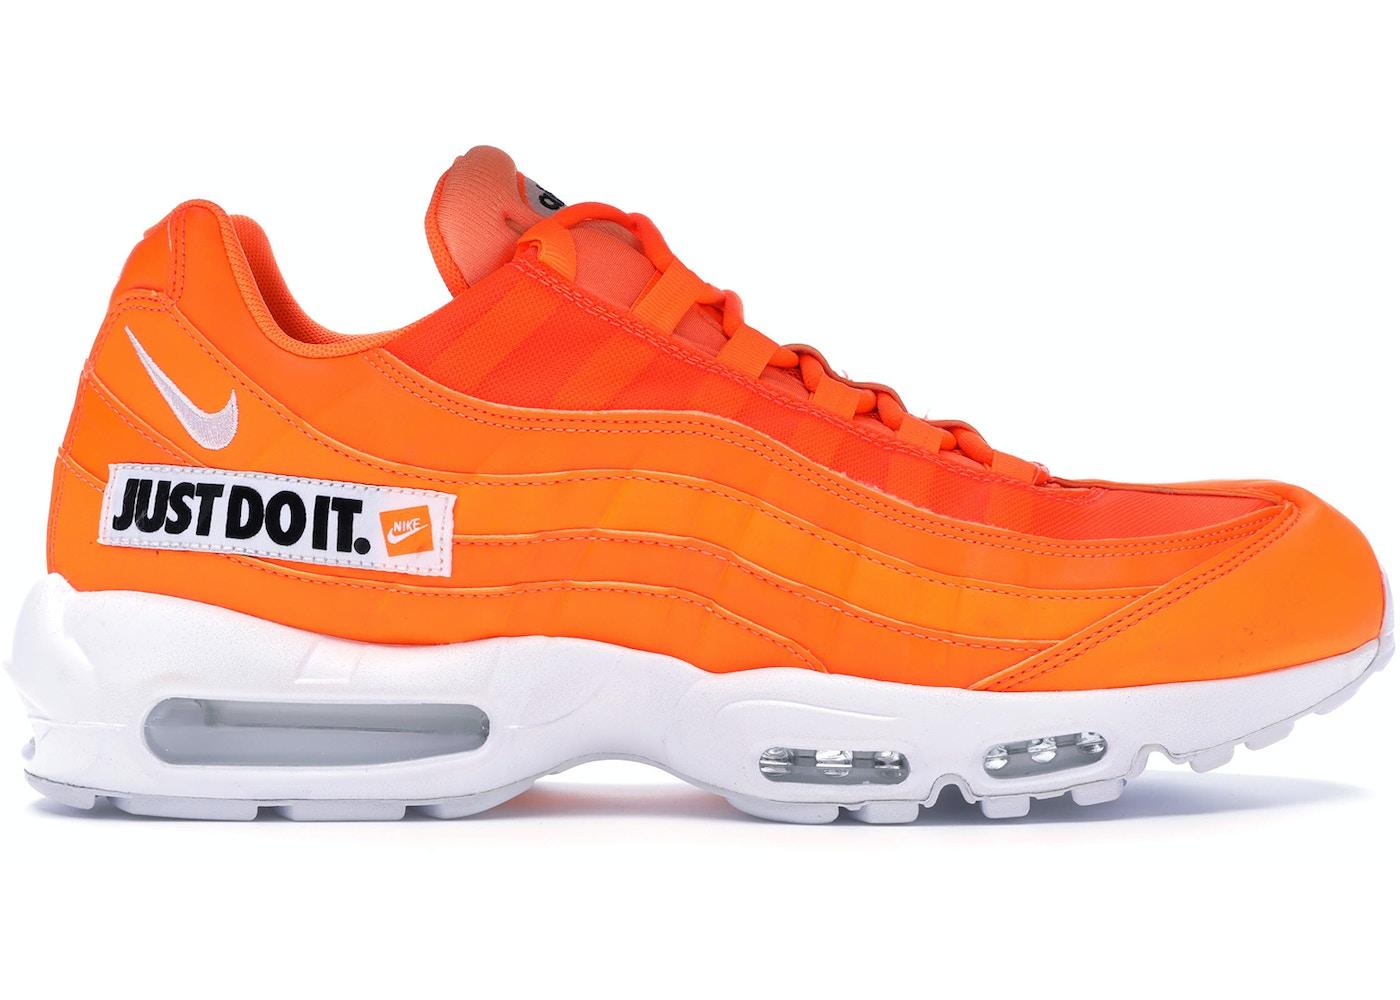 Buy Nike Air Max 95 Shoes   Deadstock Sneakers cf0e2e0cf